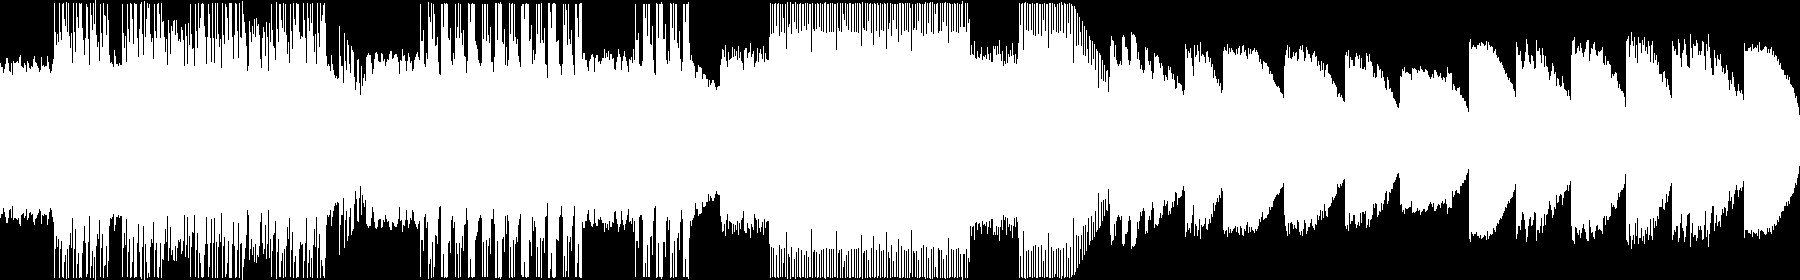 Hosanna audio waveform